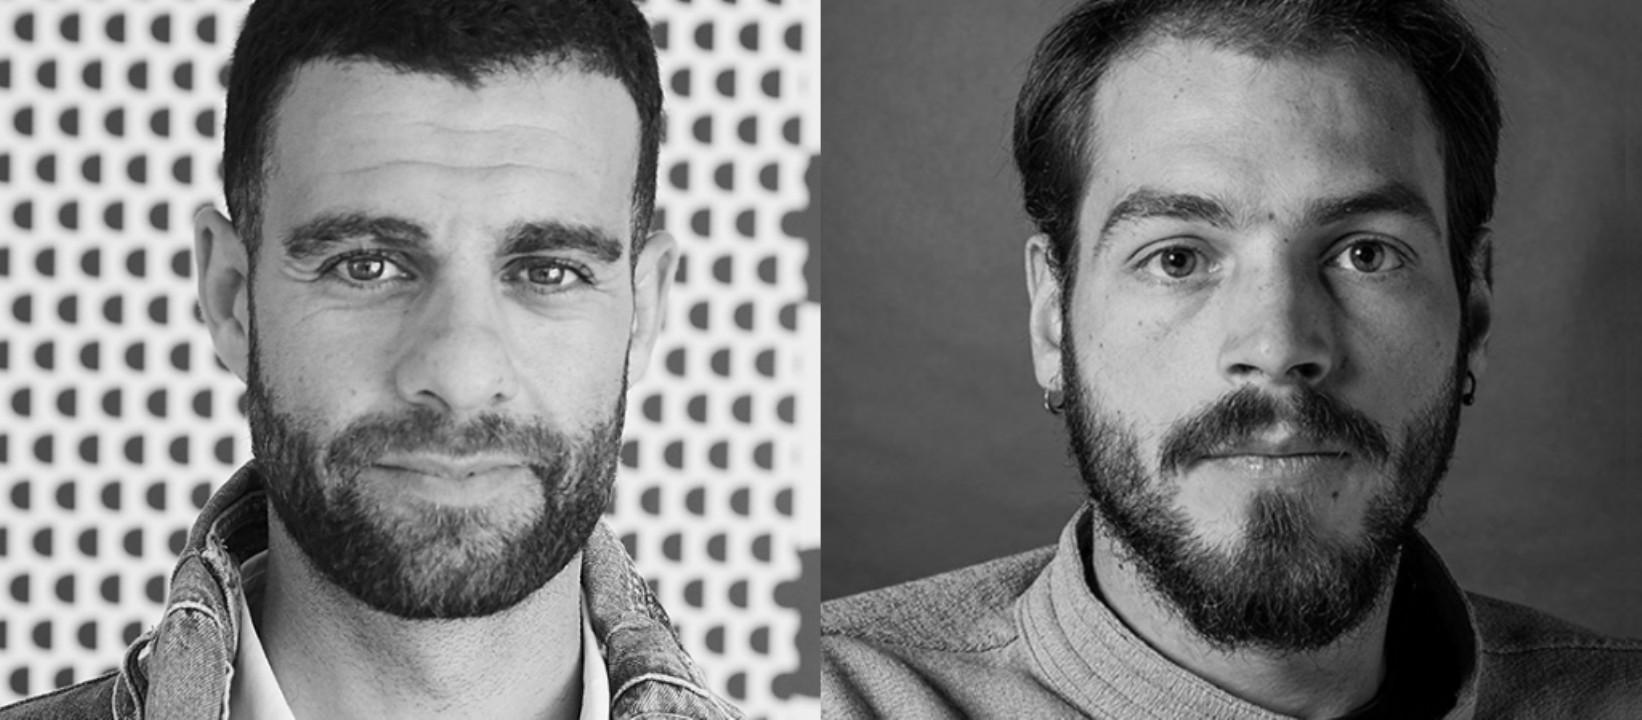 Guillem Gallego, chief marketing officer, y Giuseppe Fioretti, director artístico, en Desigual